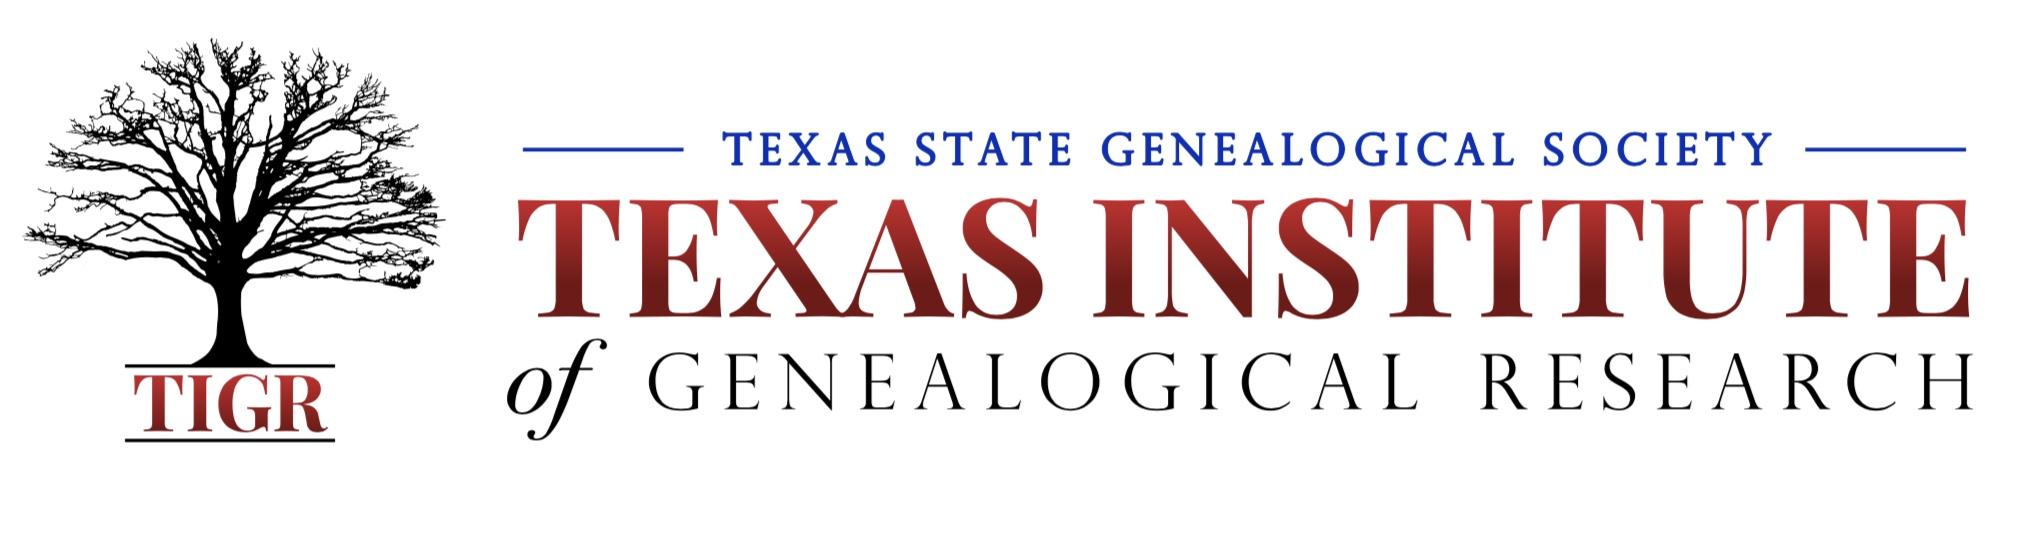 Tigr 2019 Faculty Texas State Genealogical Society